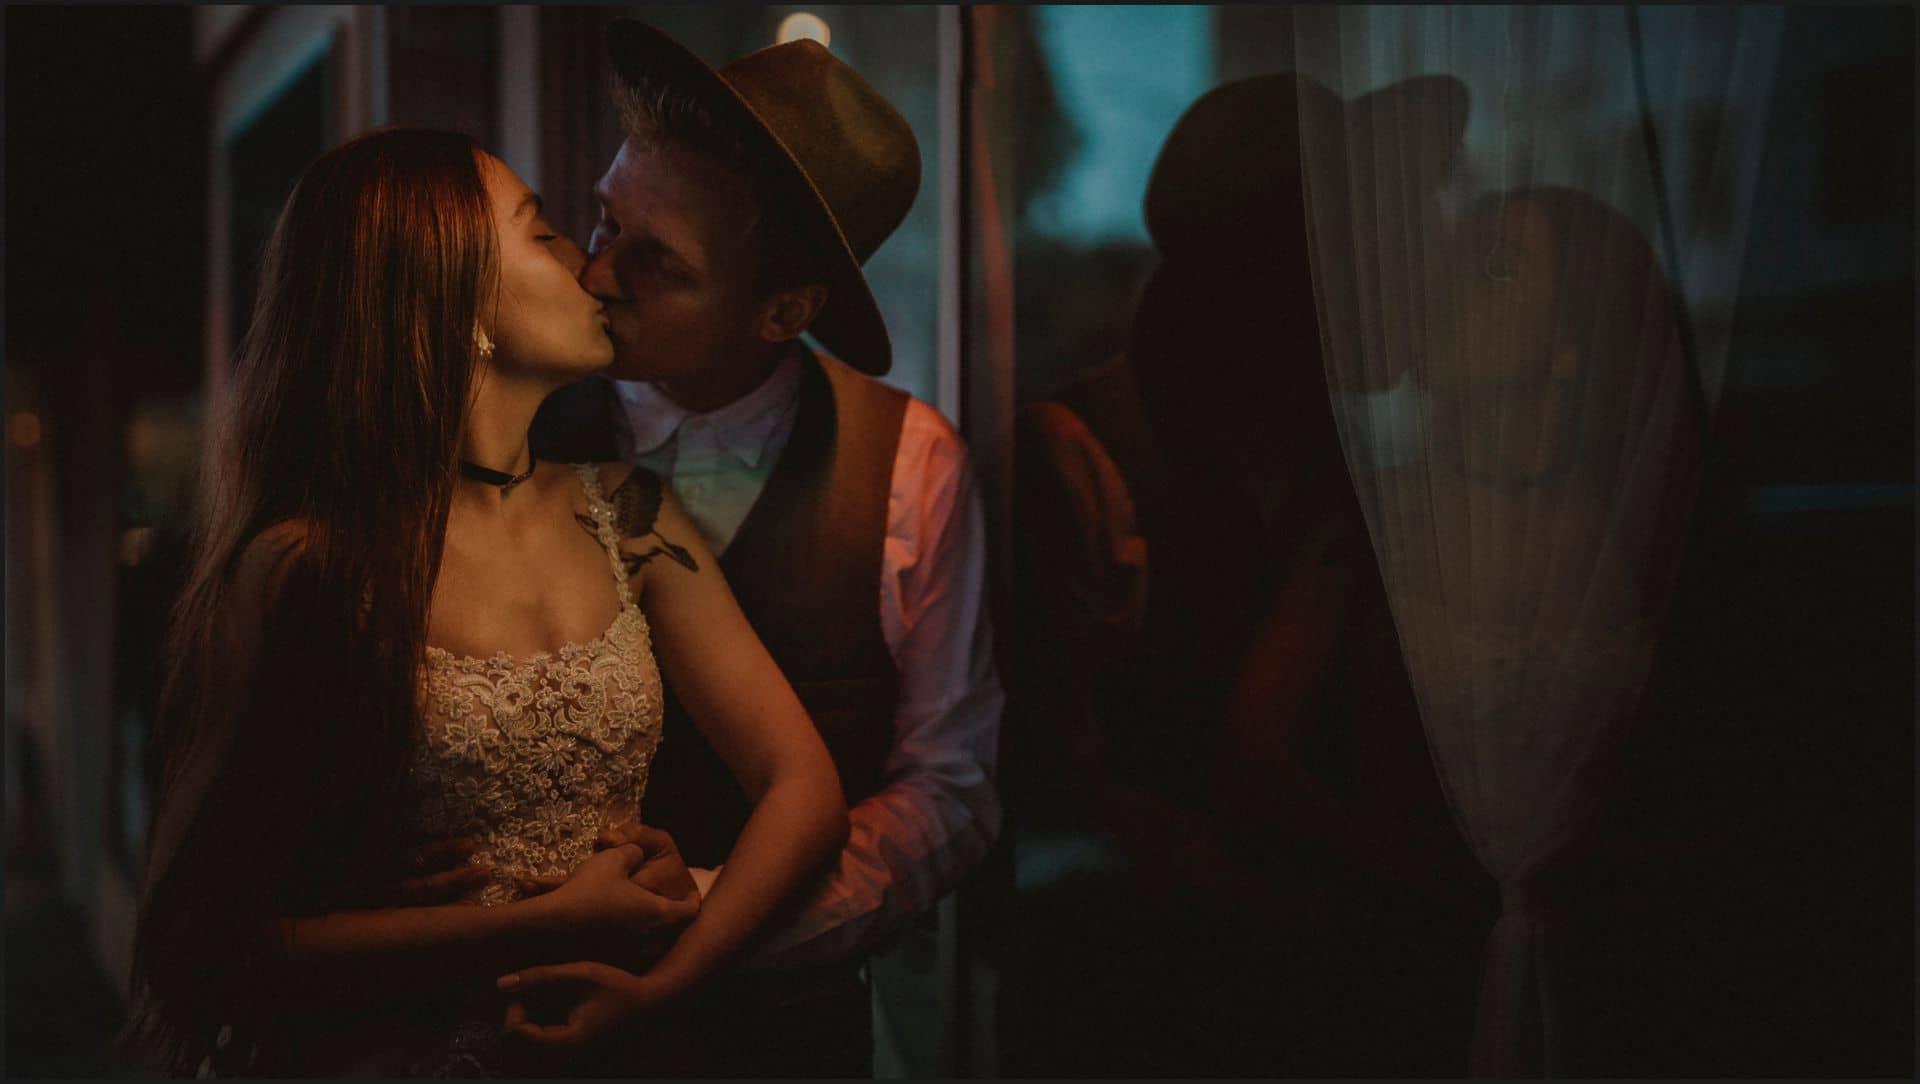 san francisco, california, elopement wedding, reflection, bride, groom, kiss